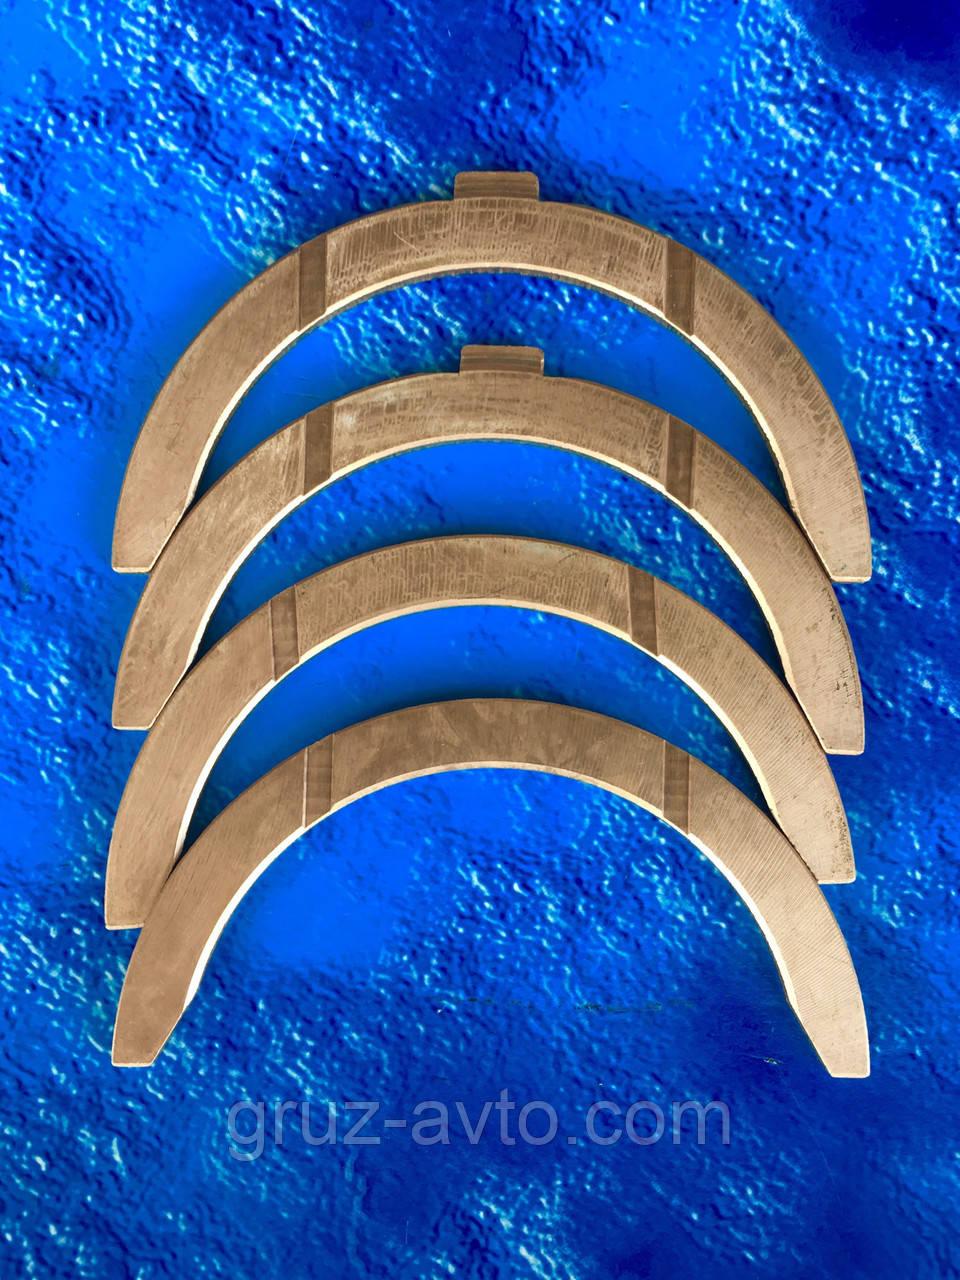 Полукольцо опорное коленвала КАМАЗ бронза/комплект-4шт./ ДААЗ/ все размеры/ 740.1005183